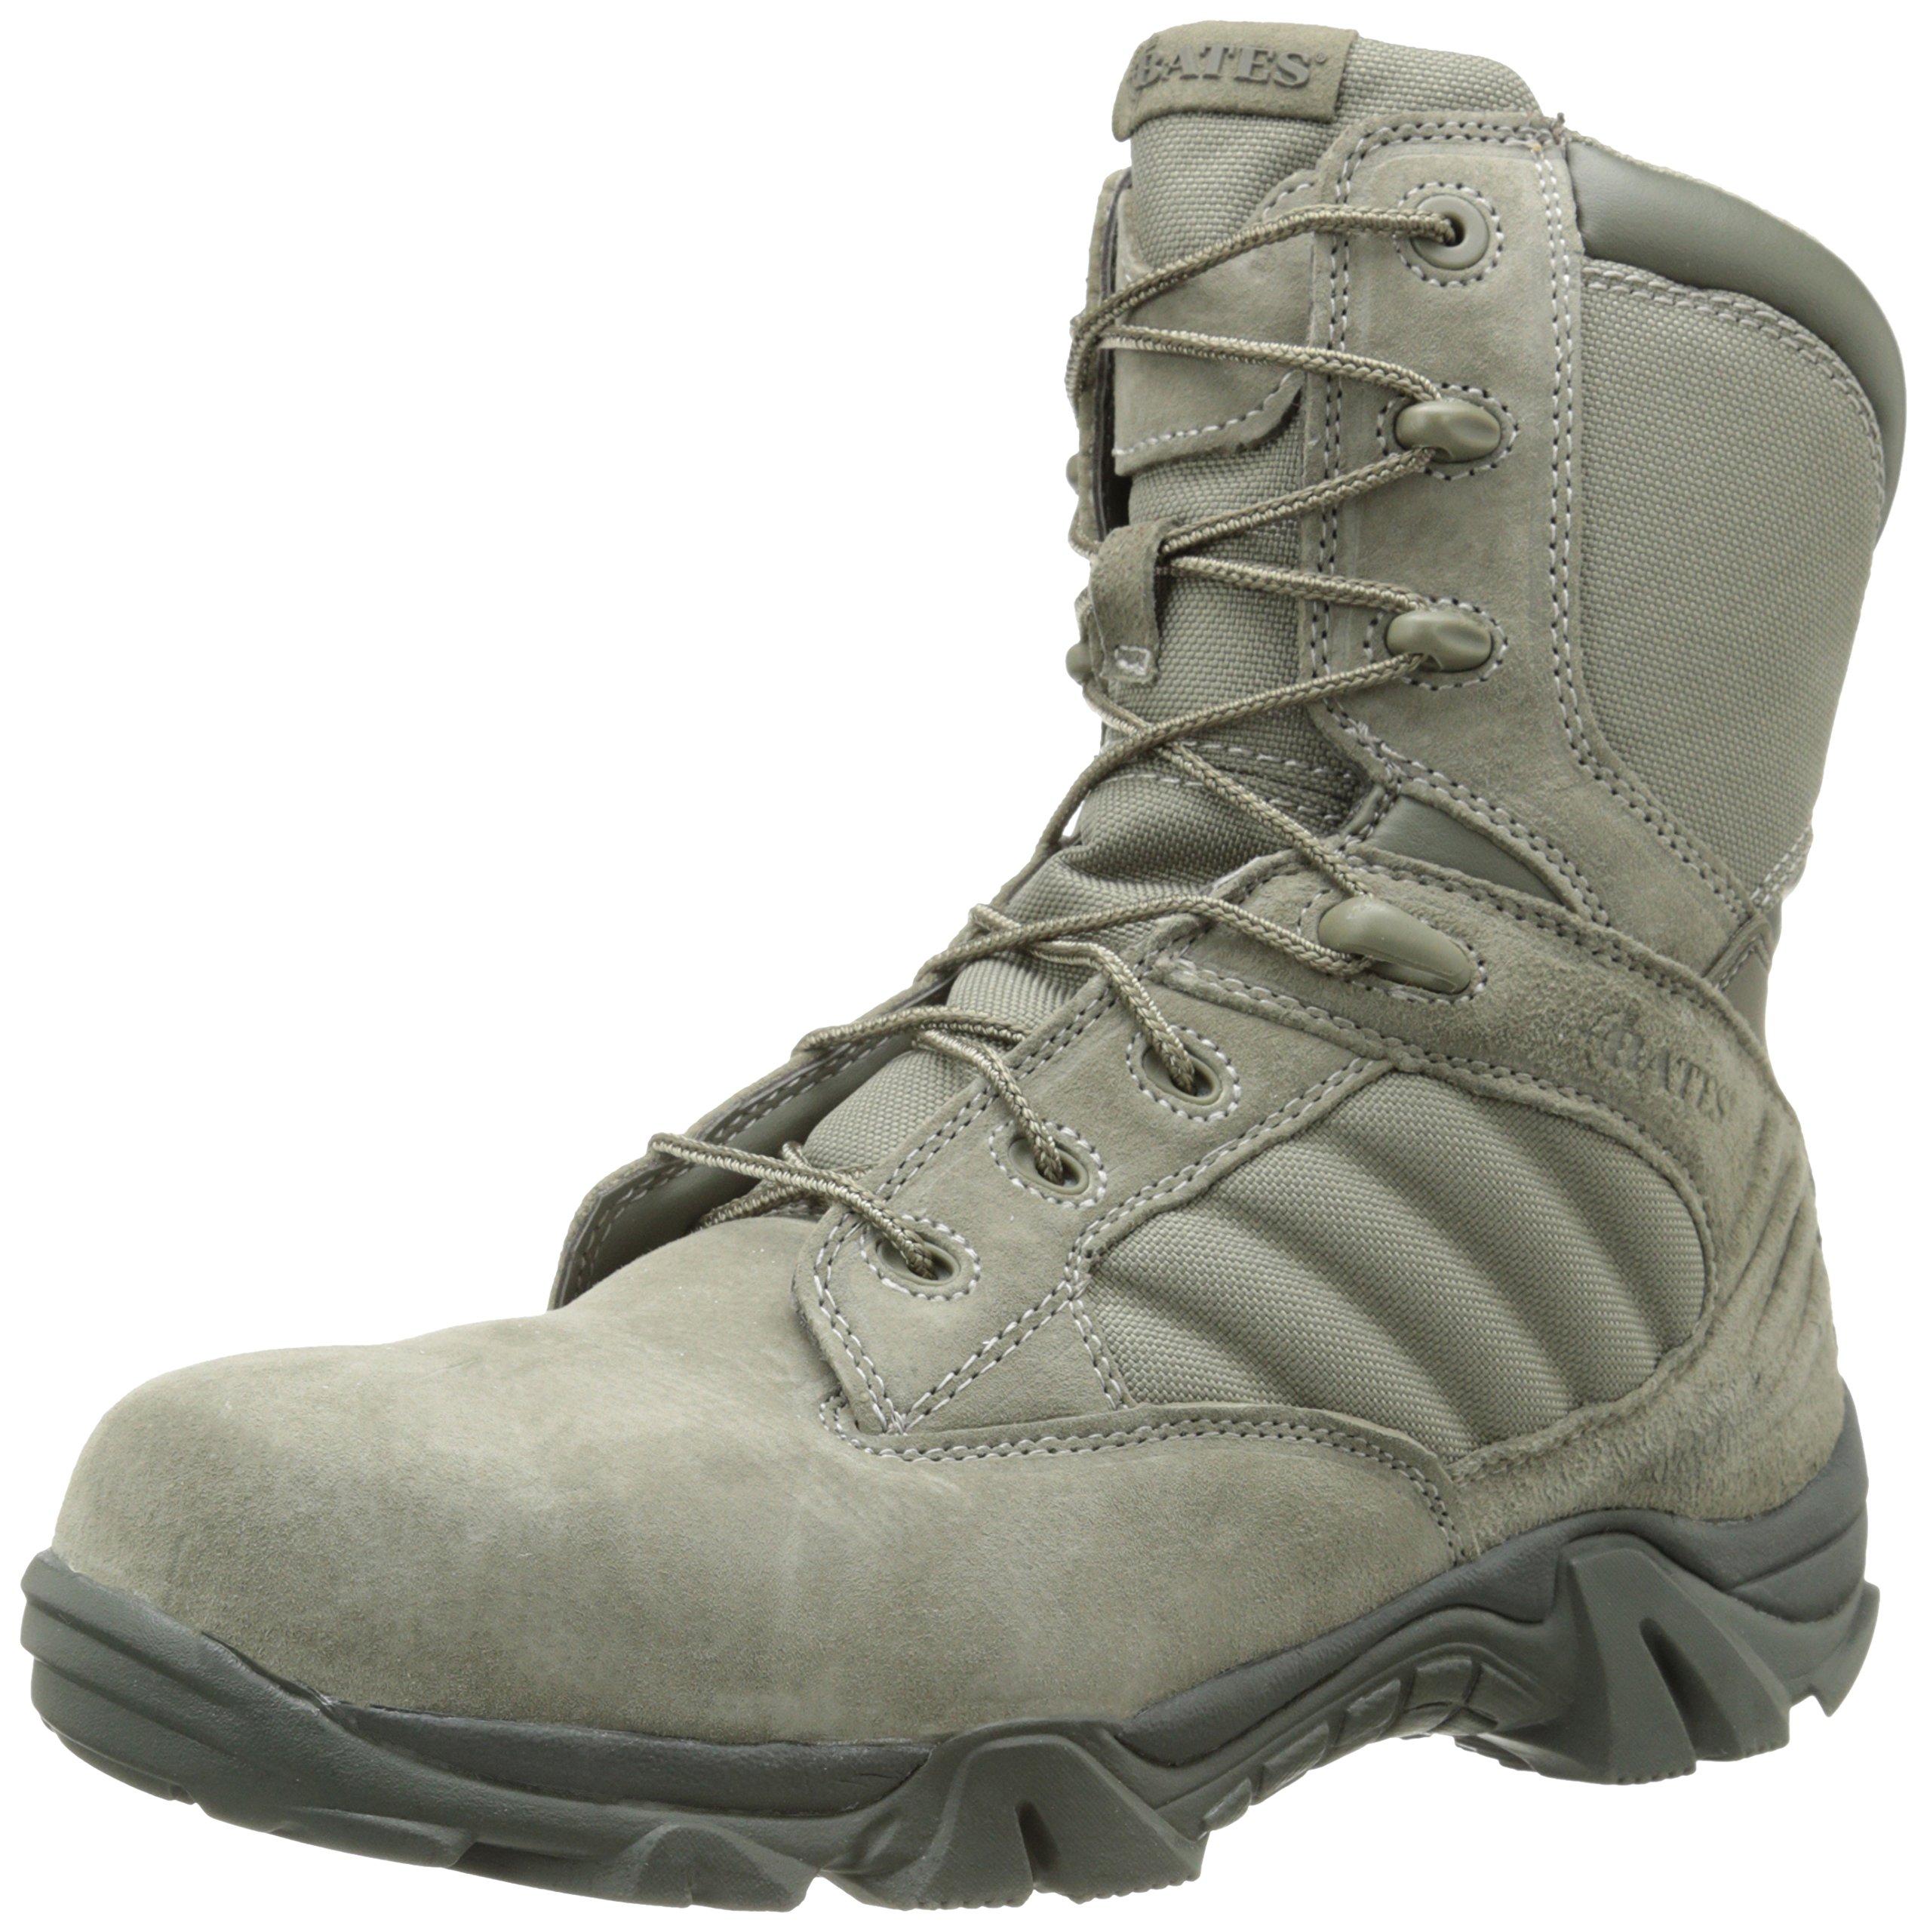 Bates Men's Gx-8 Sage 8 Inch Comp Toe Zip Uniform Boot, Sage, 12 XW US